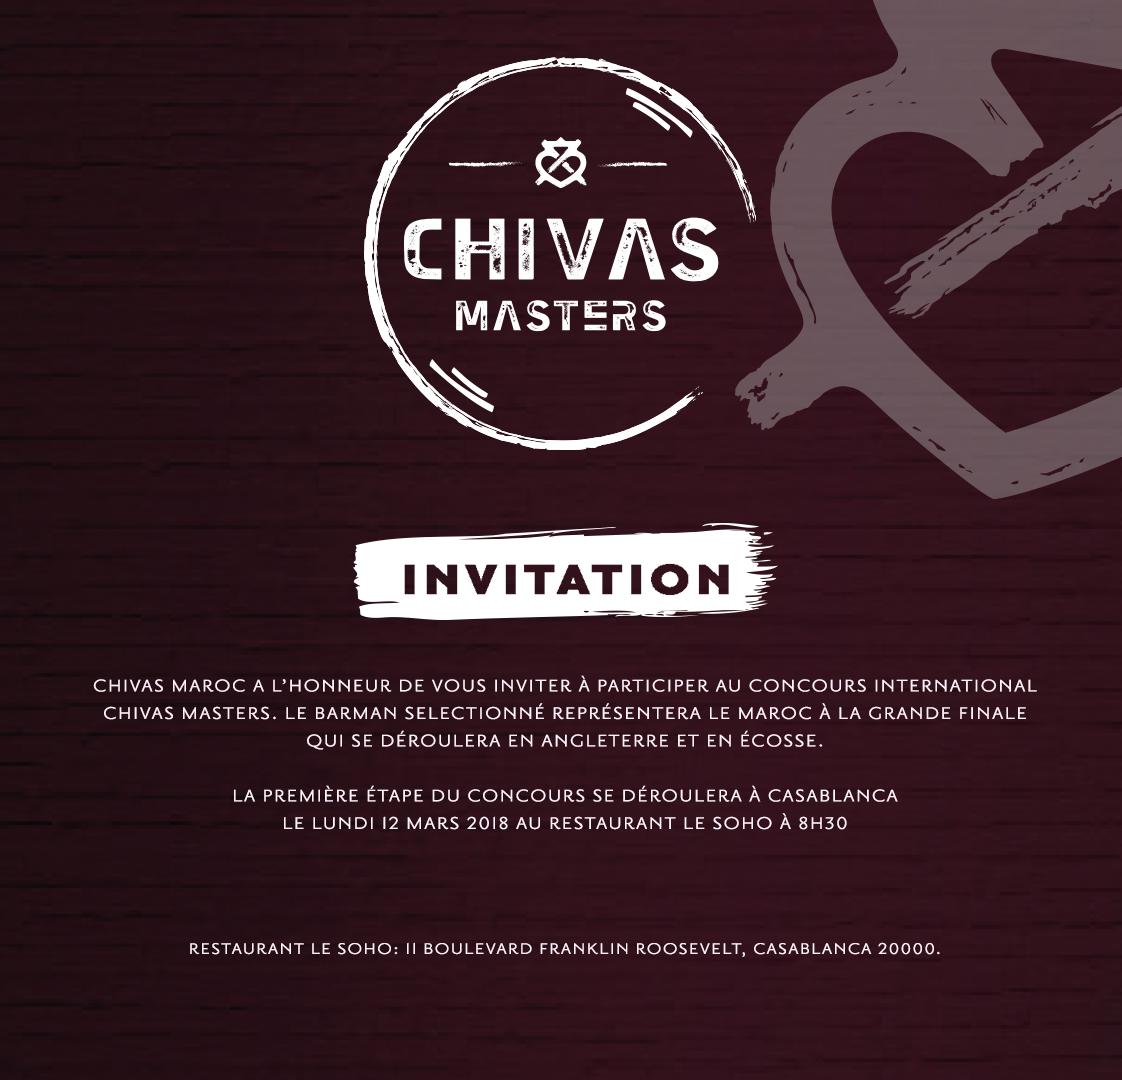 CHIVAS-MASTER-INVITATION-revue.png